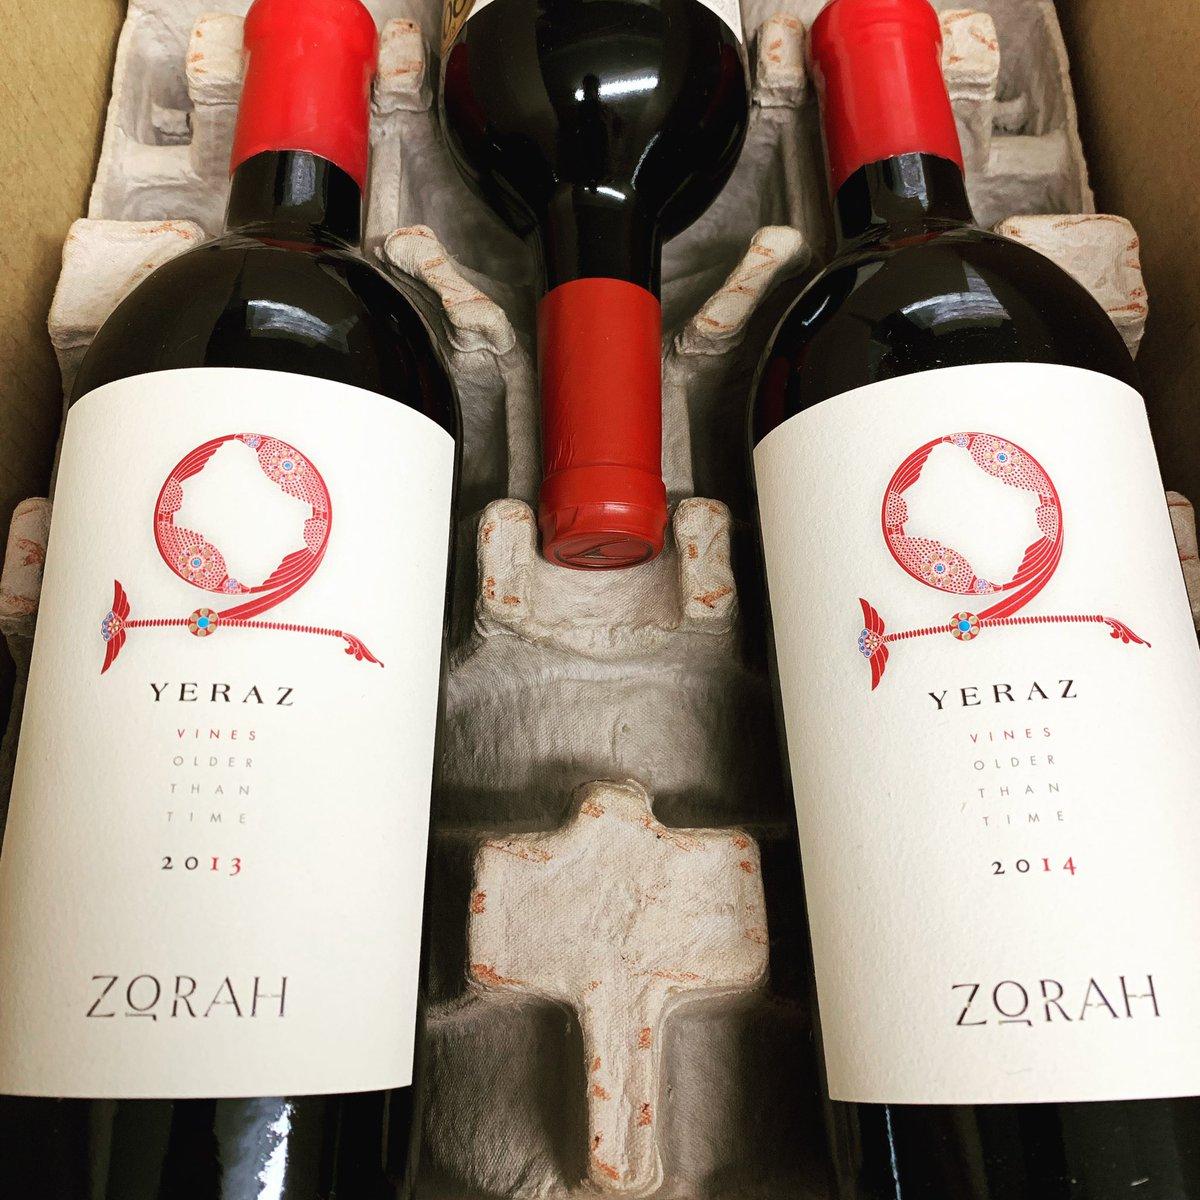 Mini-vertical of 2013 and 2014 Zorah Yeraz only at http://WinesofArmenia.com #zorah #zorahyeraz #zorahkarasi #zorahvoski #yeraz #karasi #voski #areni #armenian #armenia #wineofarmenia #winesofarmenia #armenianwines #redwine #vertical #verticaltasting #minivertical @StepanWBpic.twitter.com/Bm5Px0s8Bs